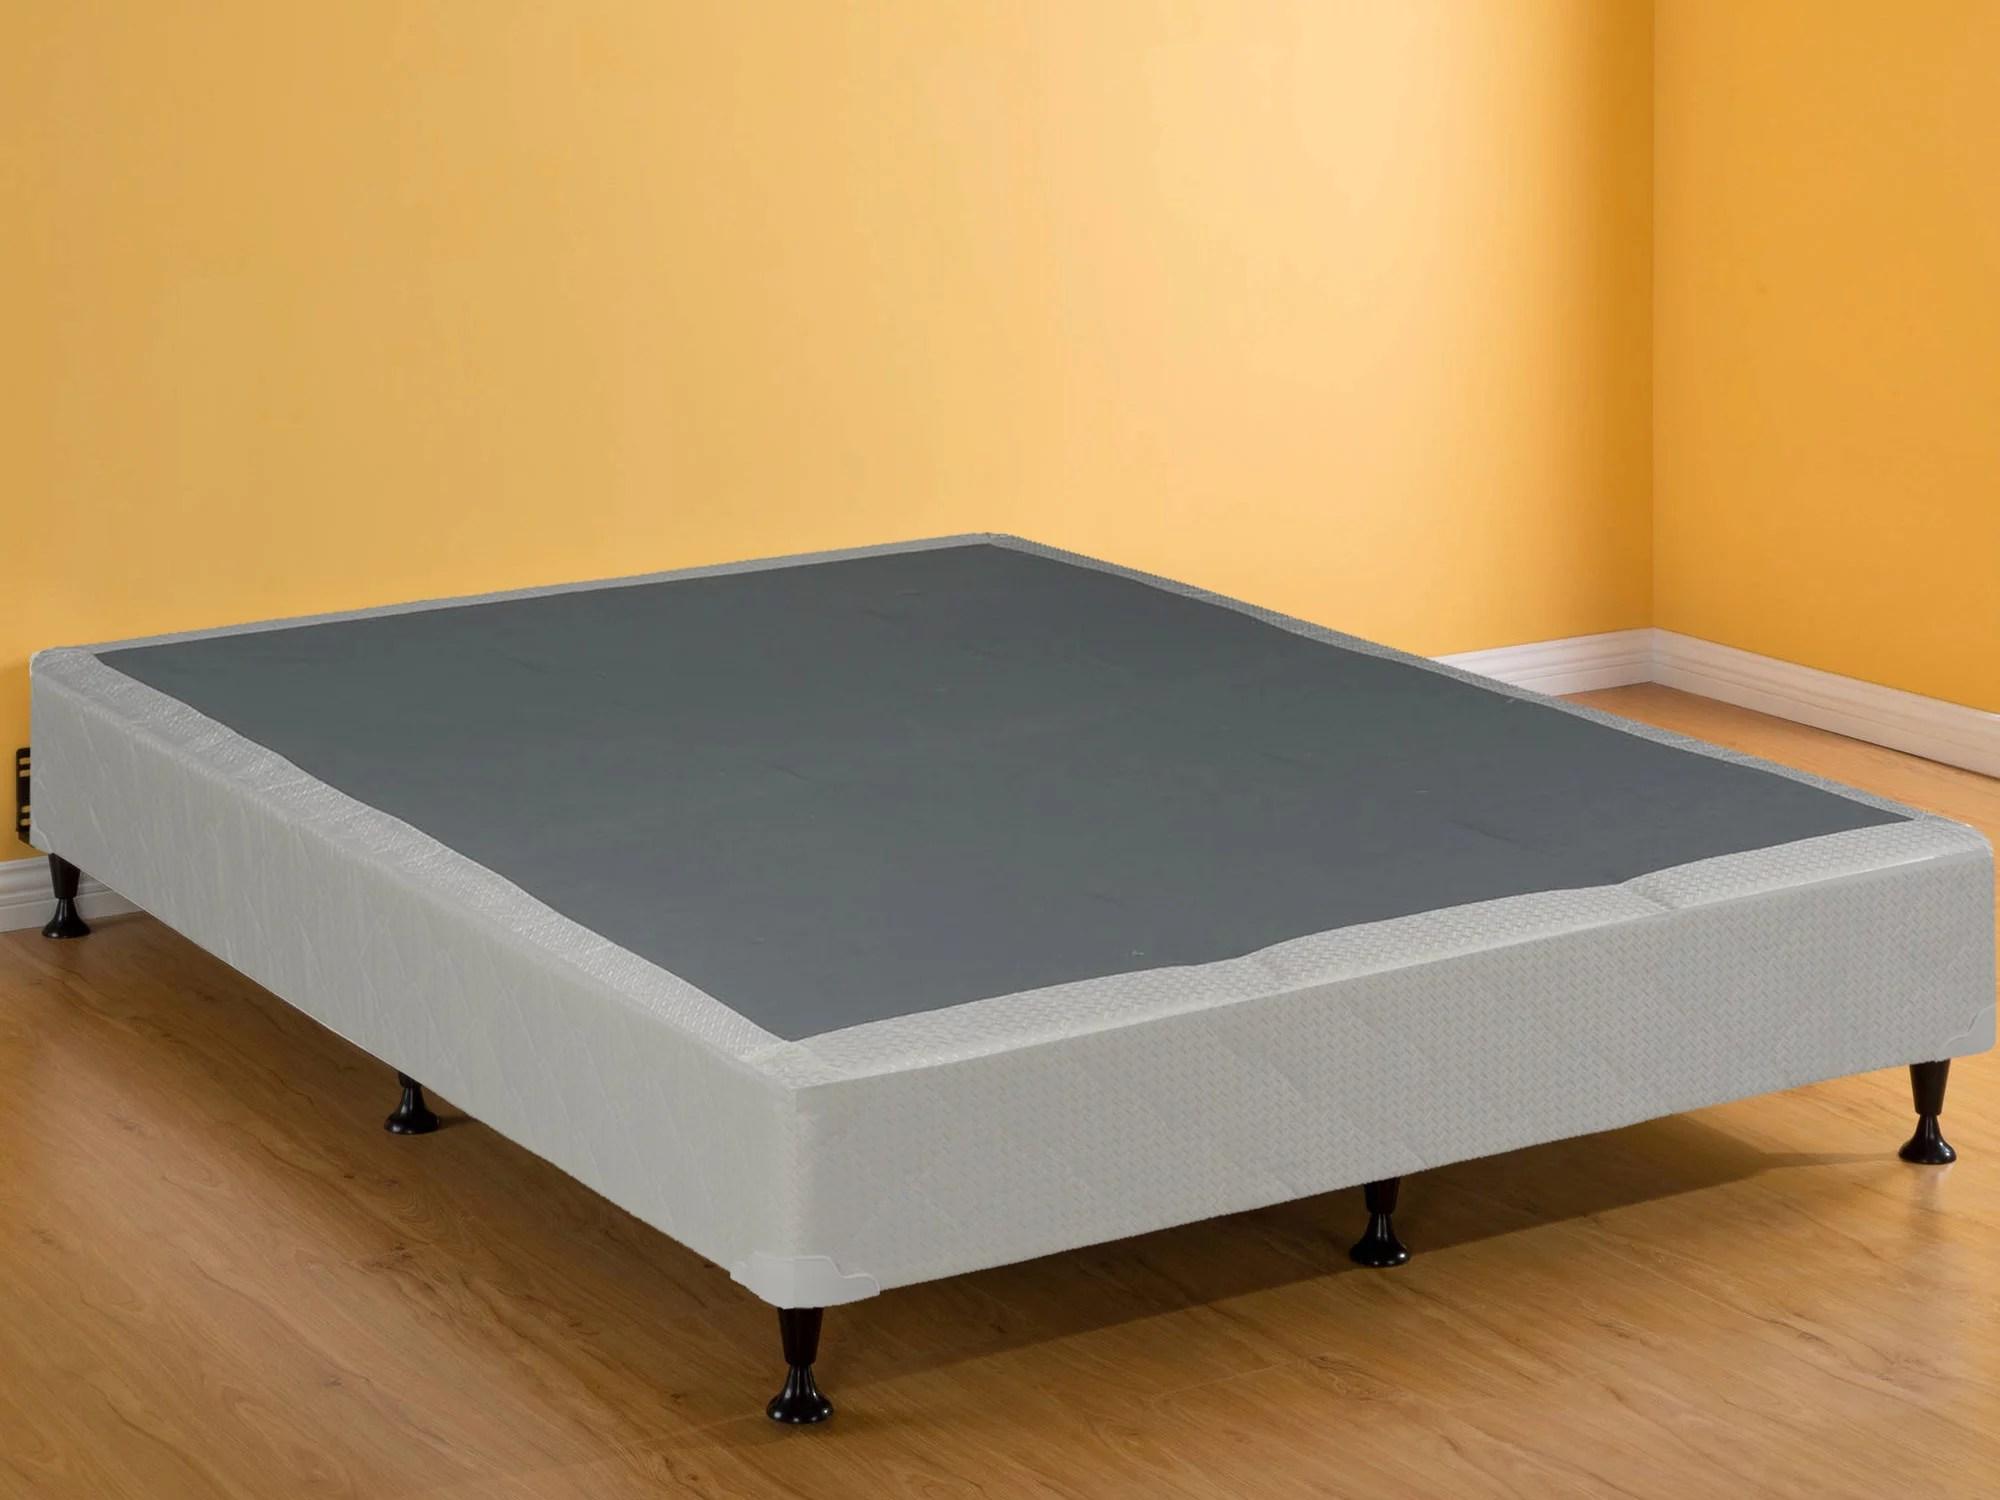 continental mattress 8 box spring foundation for mattress full size walmart com